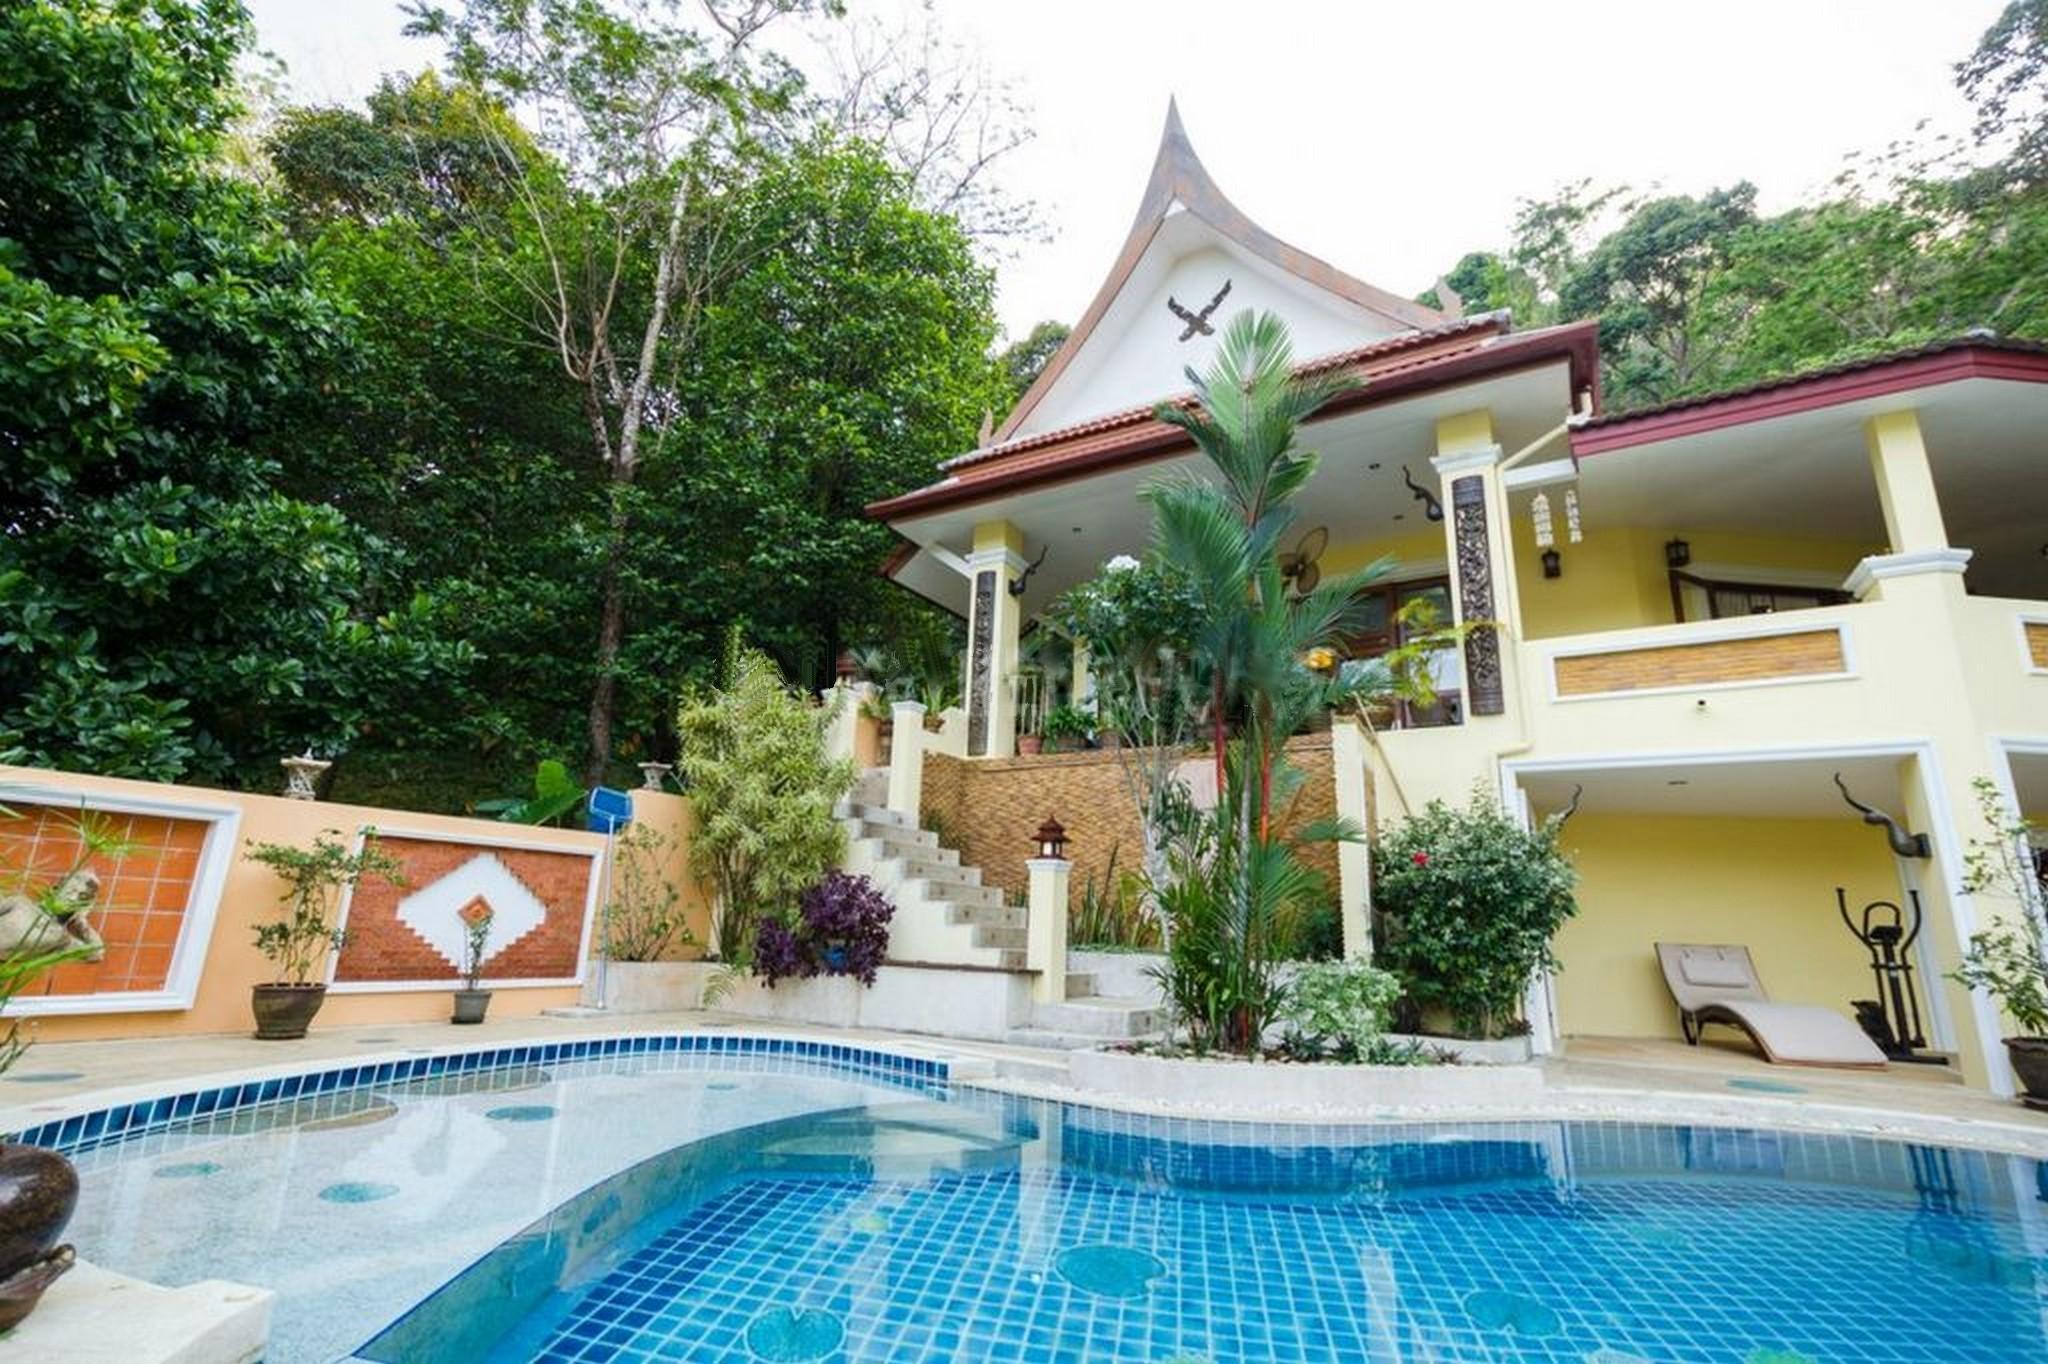 Villa Sawadee With Swiming Pool In Tropical Garden